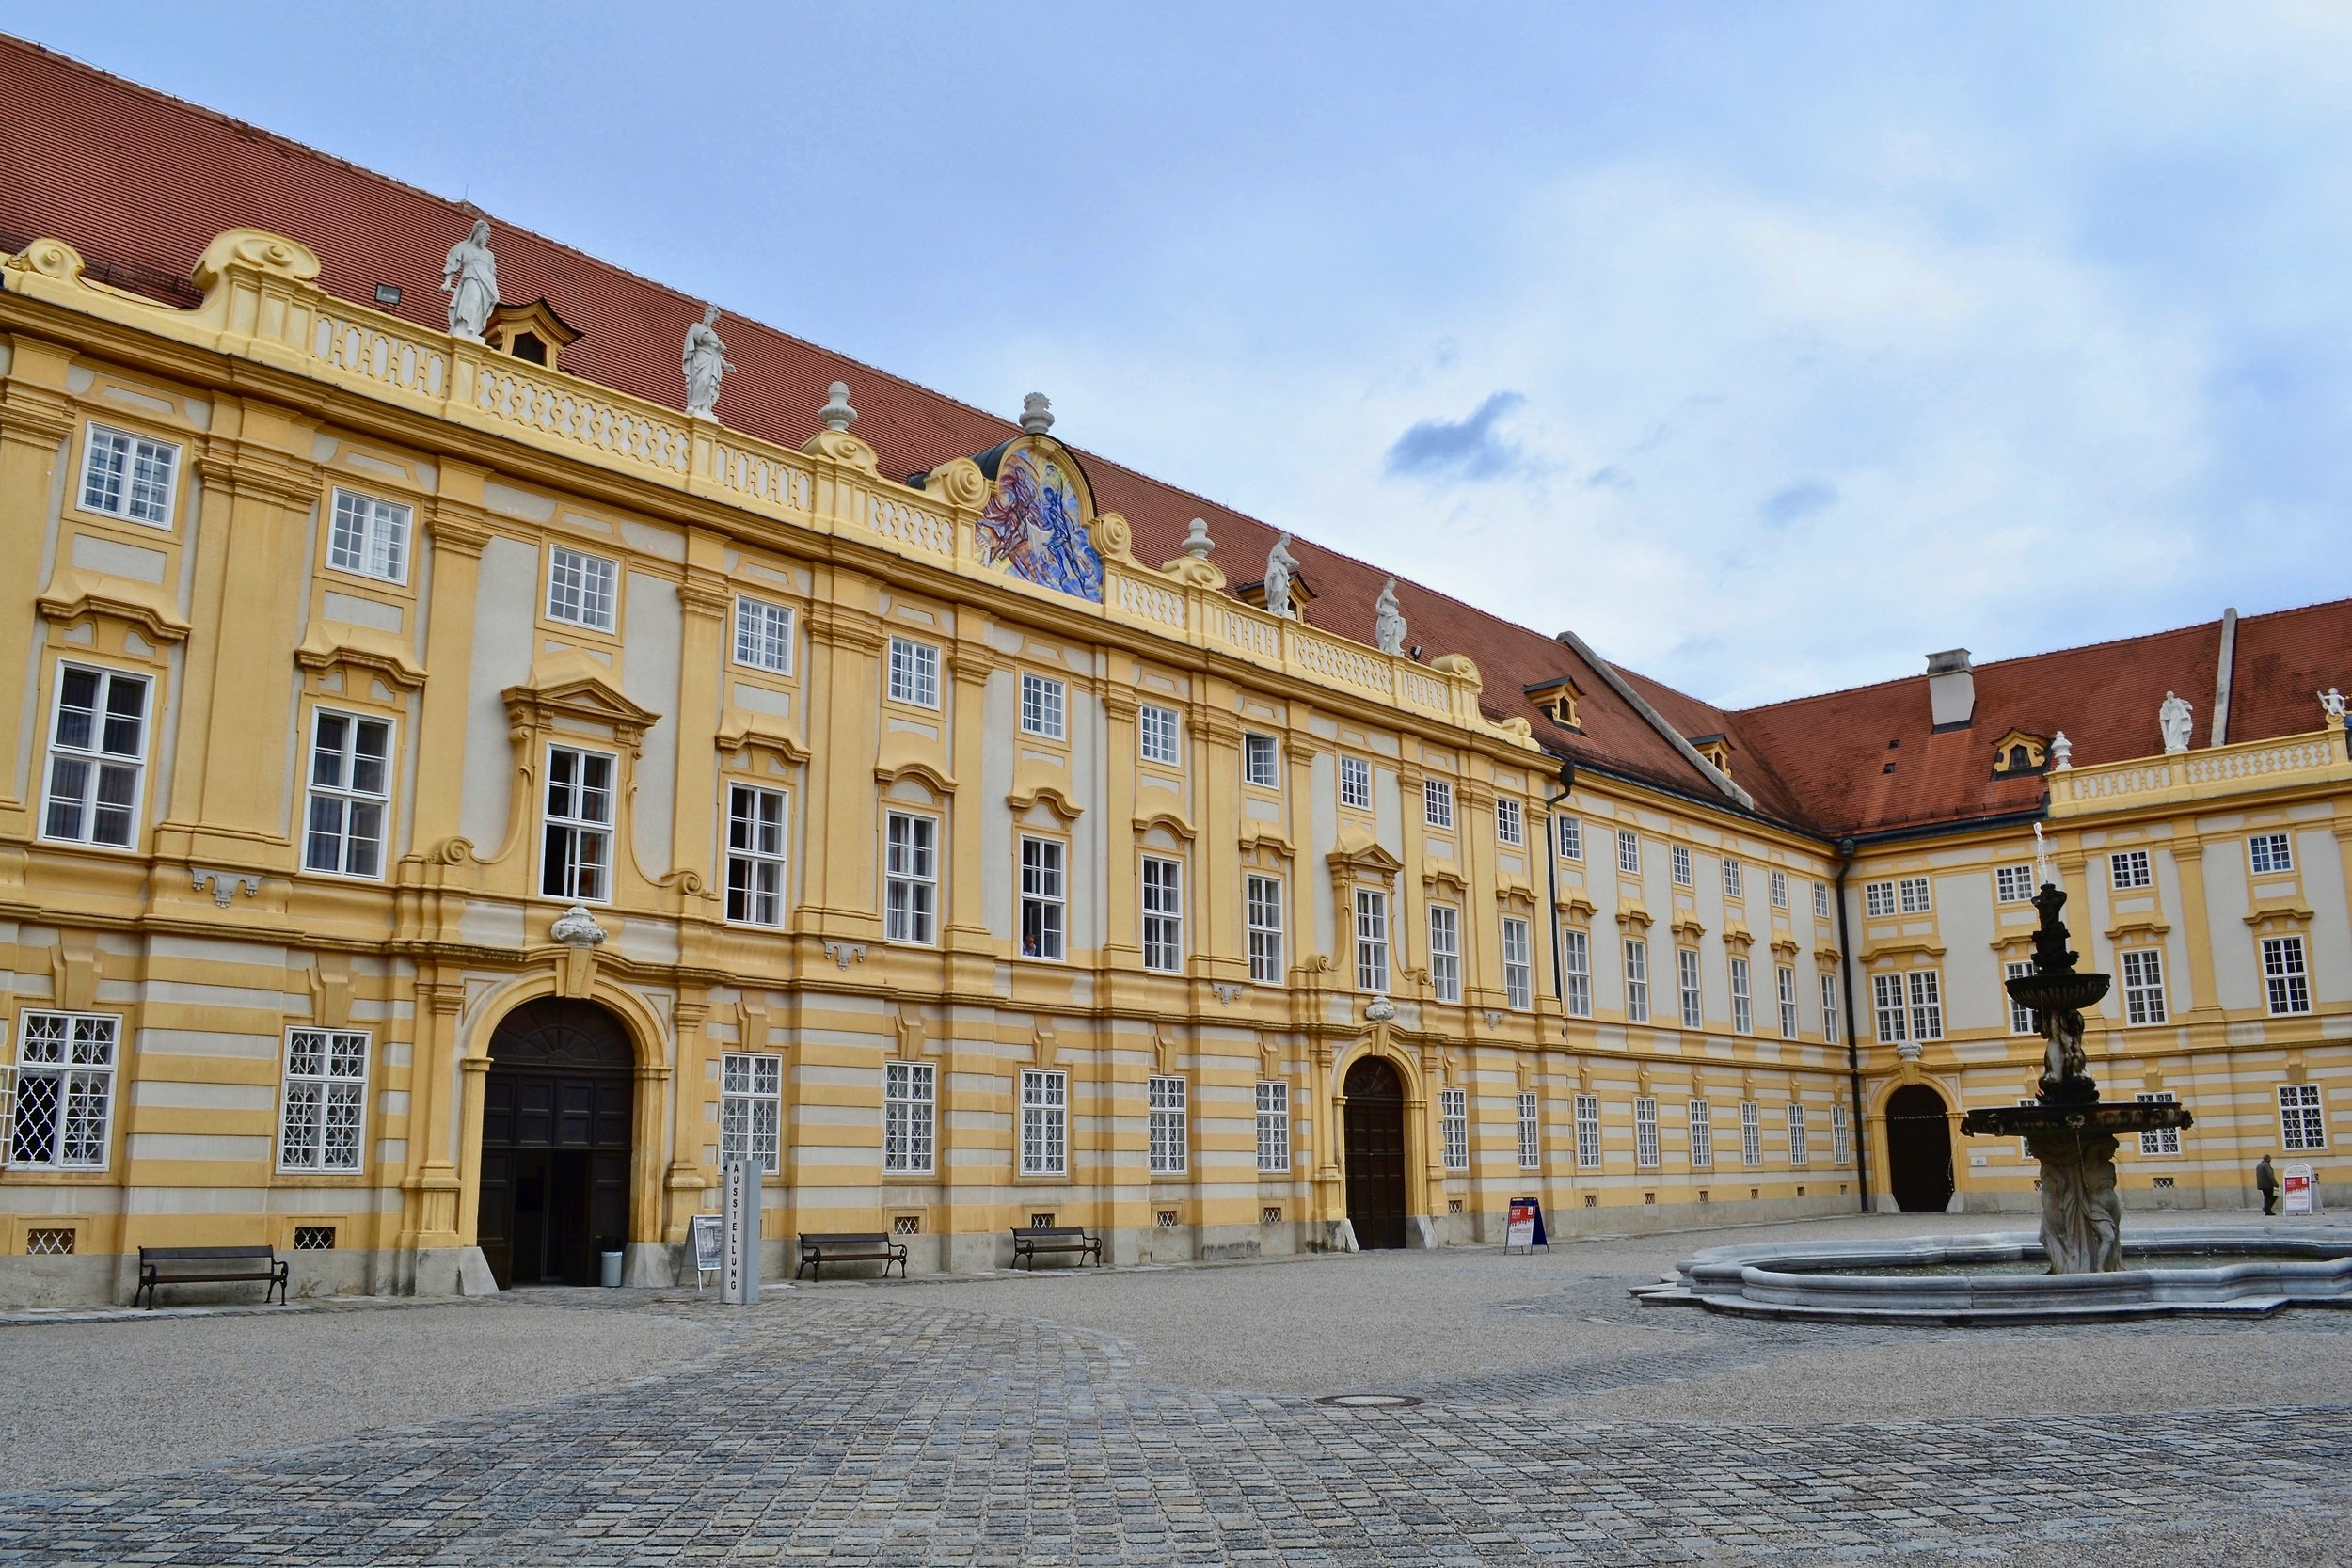 Melk Abbey Courtyard